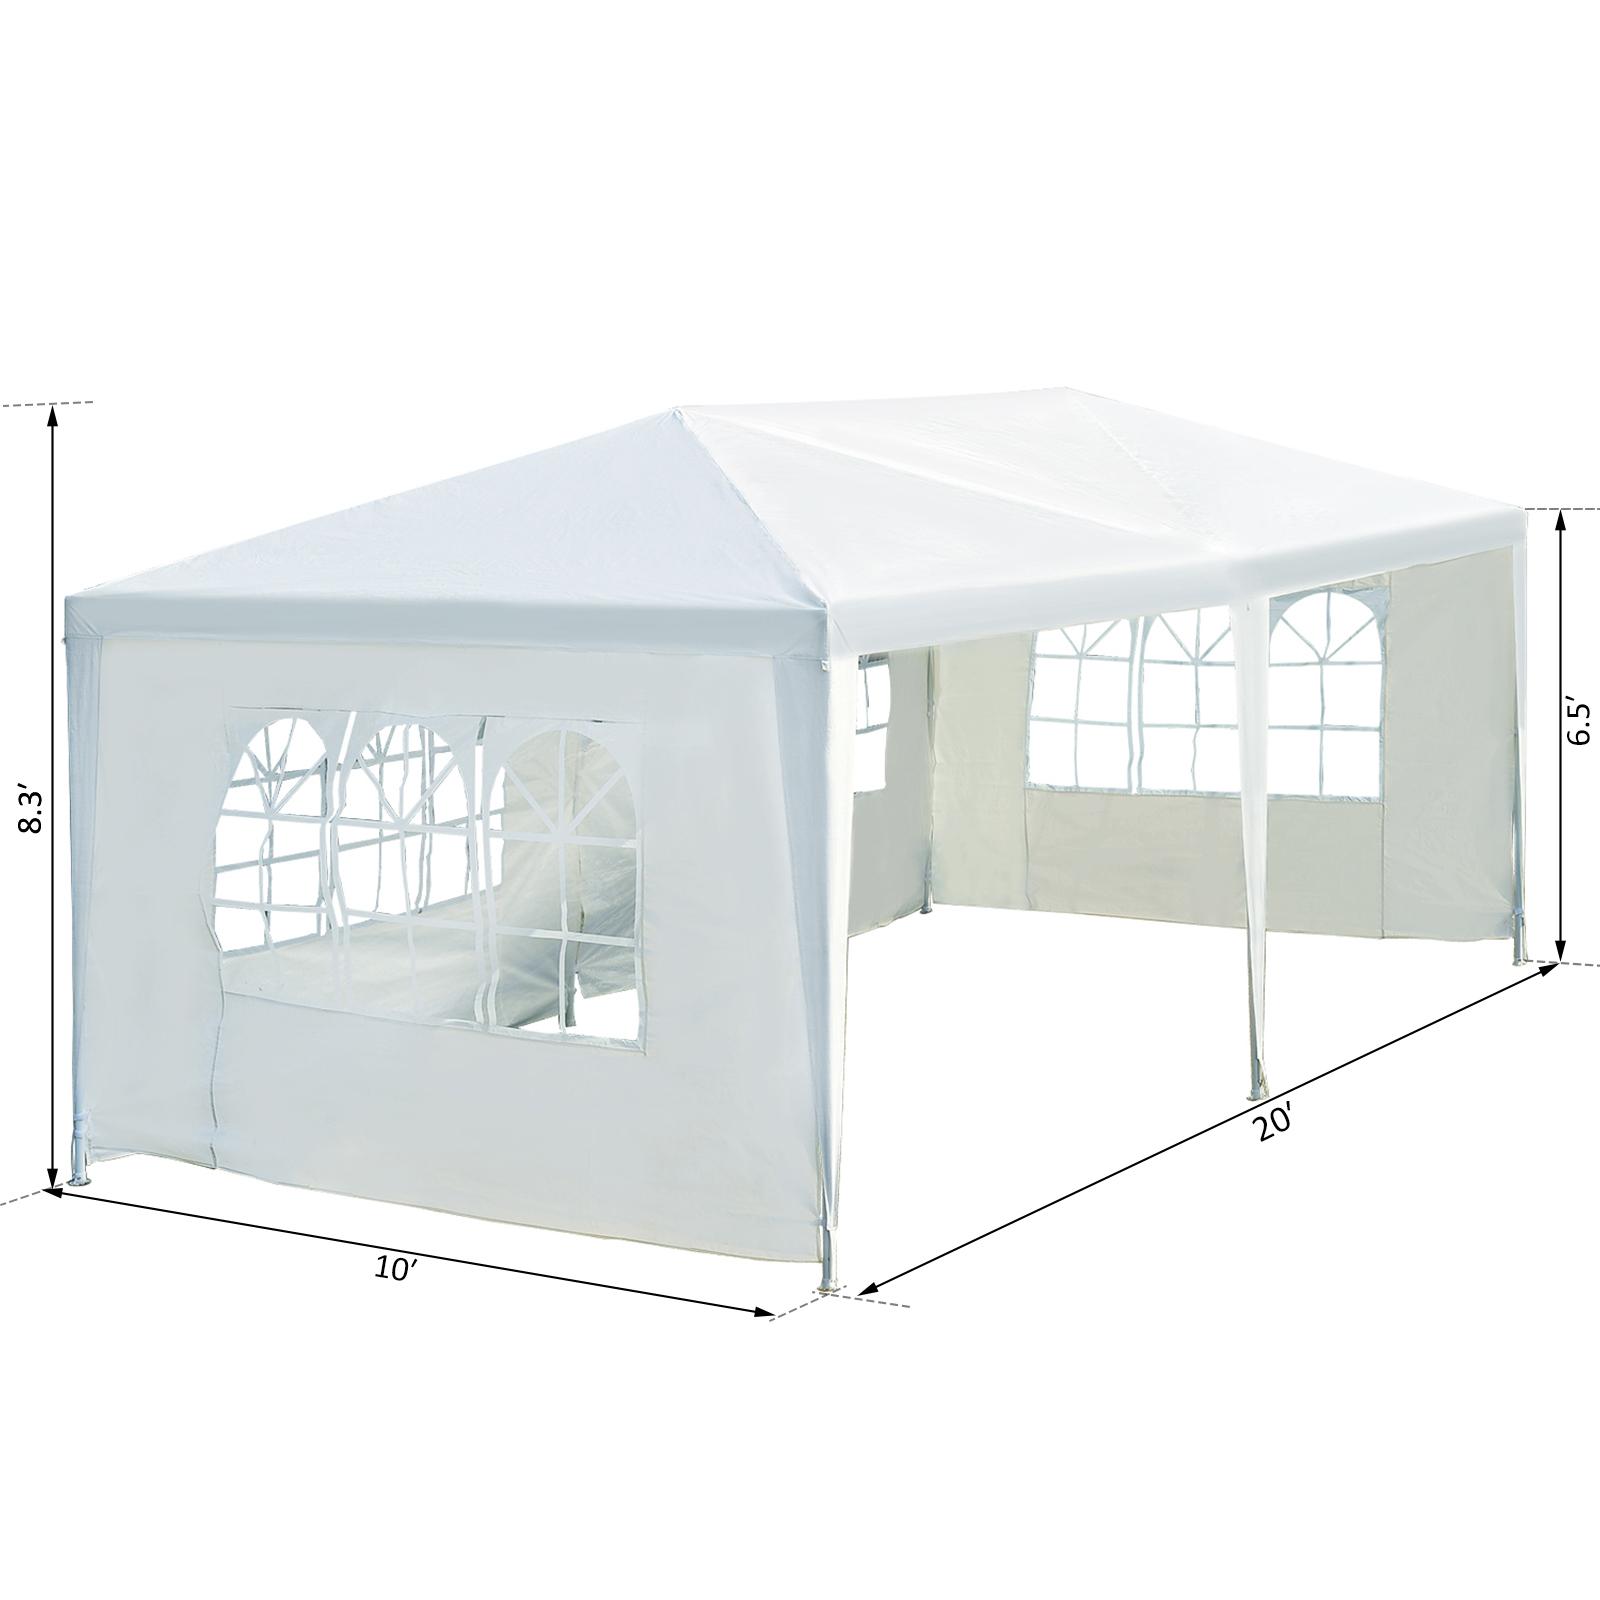 10-x-20-039-10-x-30-039-Party-Wedding-Tent-Outdoor-Gazebo-Canopy-Tent-w-Sidewalls thumbnail 3